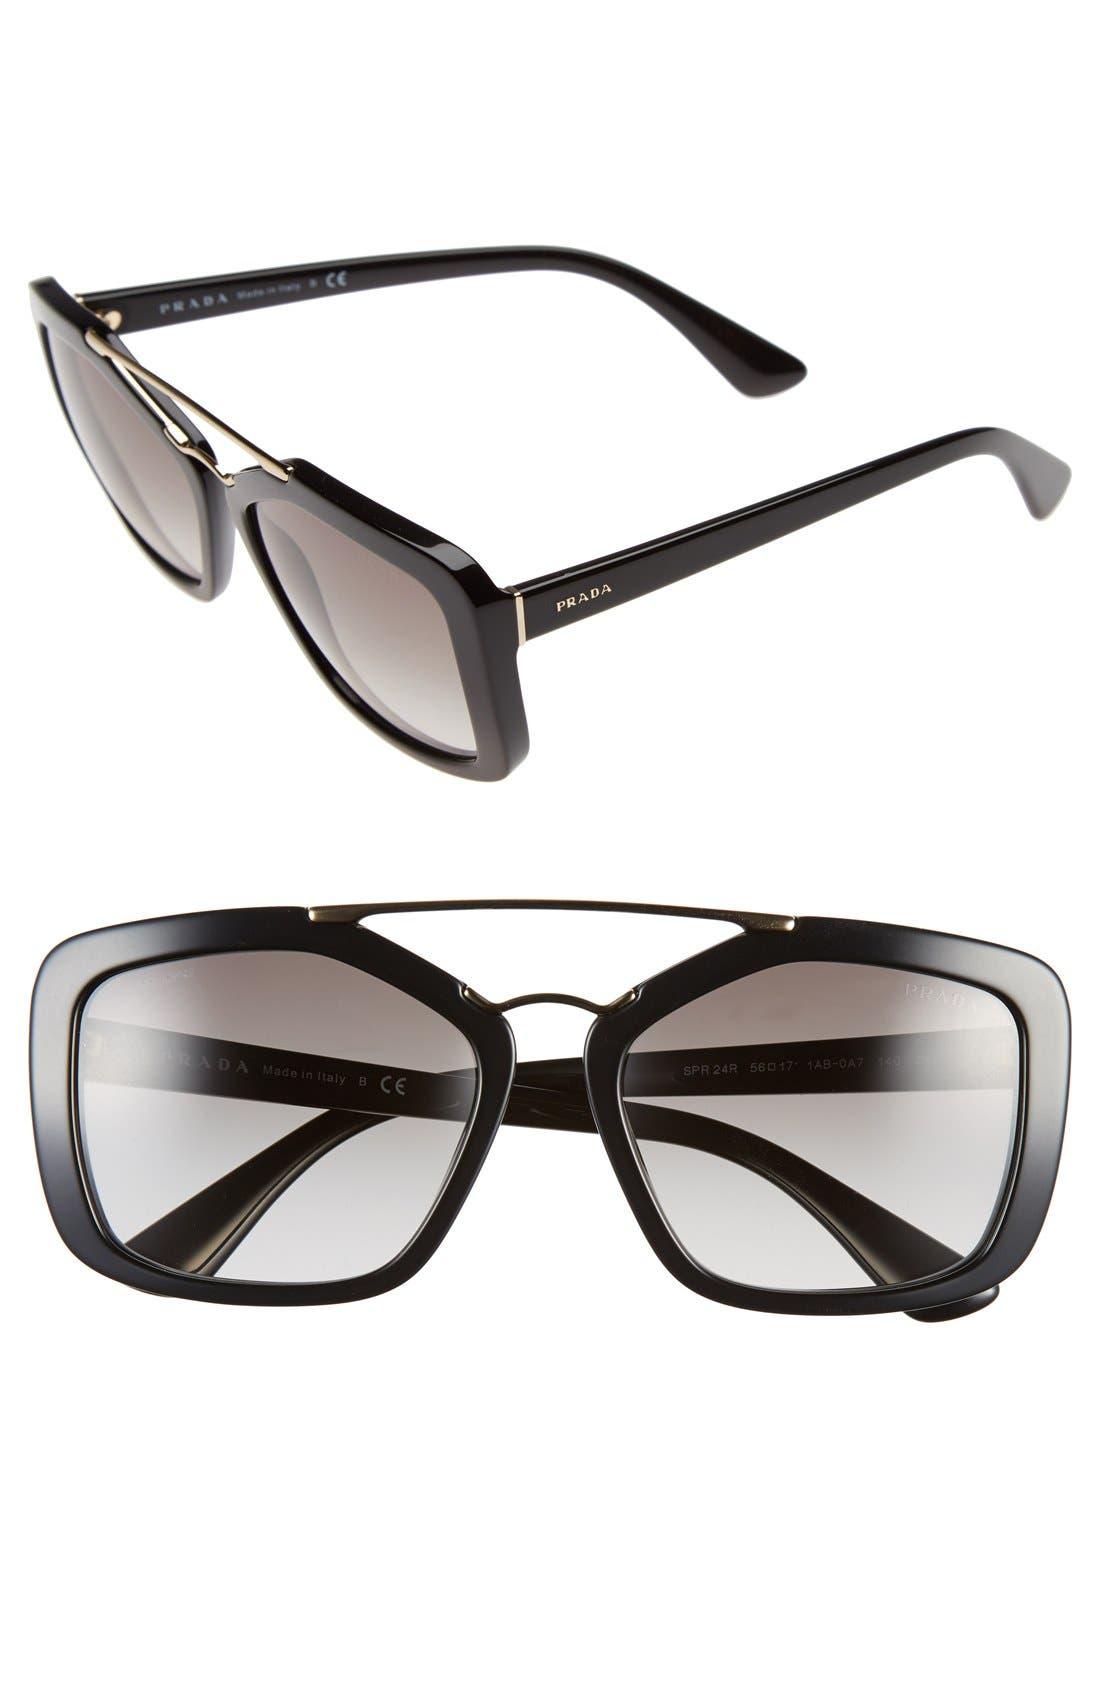 56mm Angular Sunglasses,                             Main thumbnail 1, color,                             Black